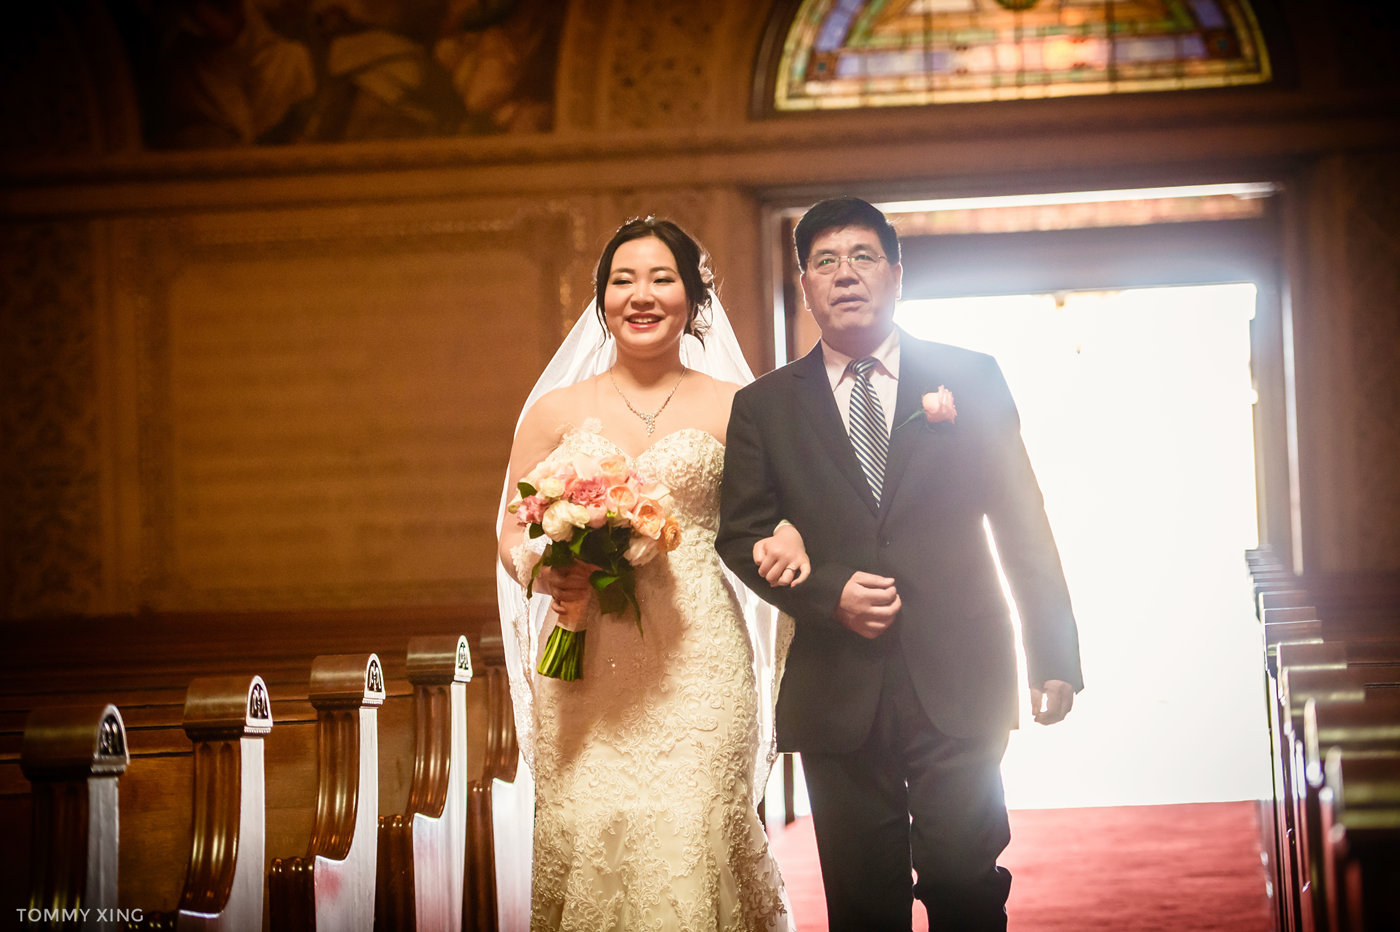 STANFORD MEMORIAL CHURCH WEDDING - Wenjie & Chengcheng - SAN FRANCISCO BAY AREA 斯坦福教堂婚礼跟拍 - 洛杉矶婚礼婚纱照摄影师 Tommy Xing Photography074.jpg